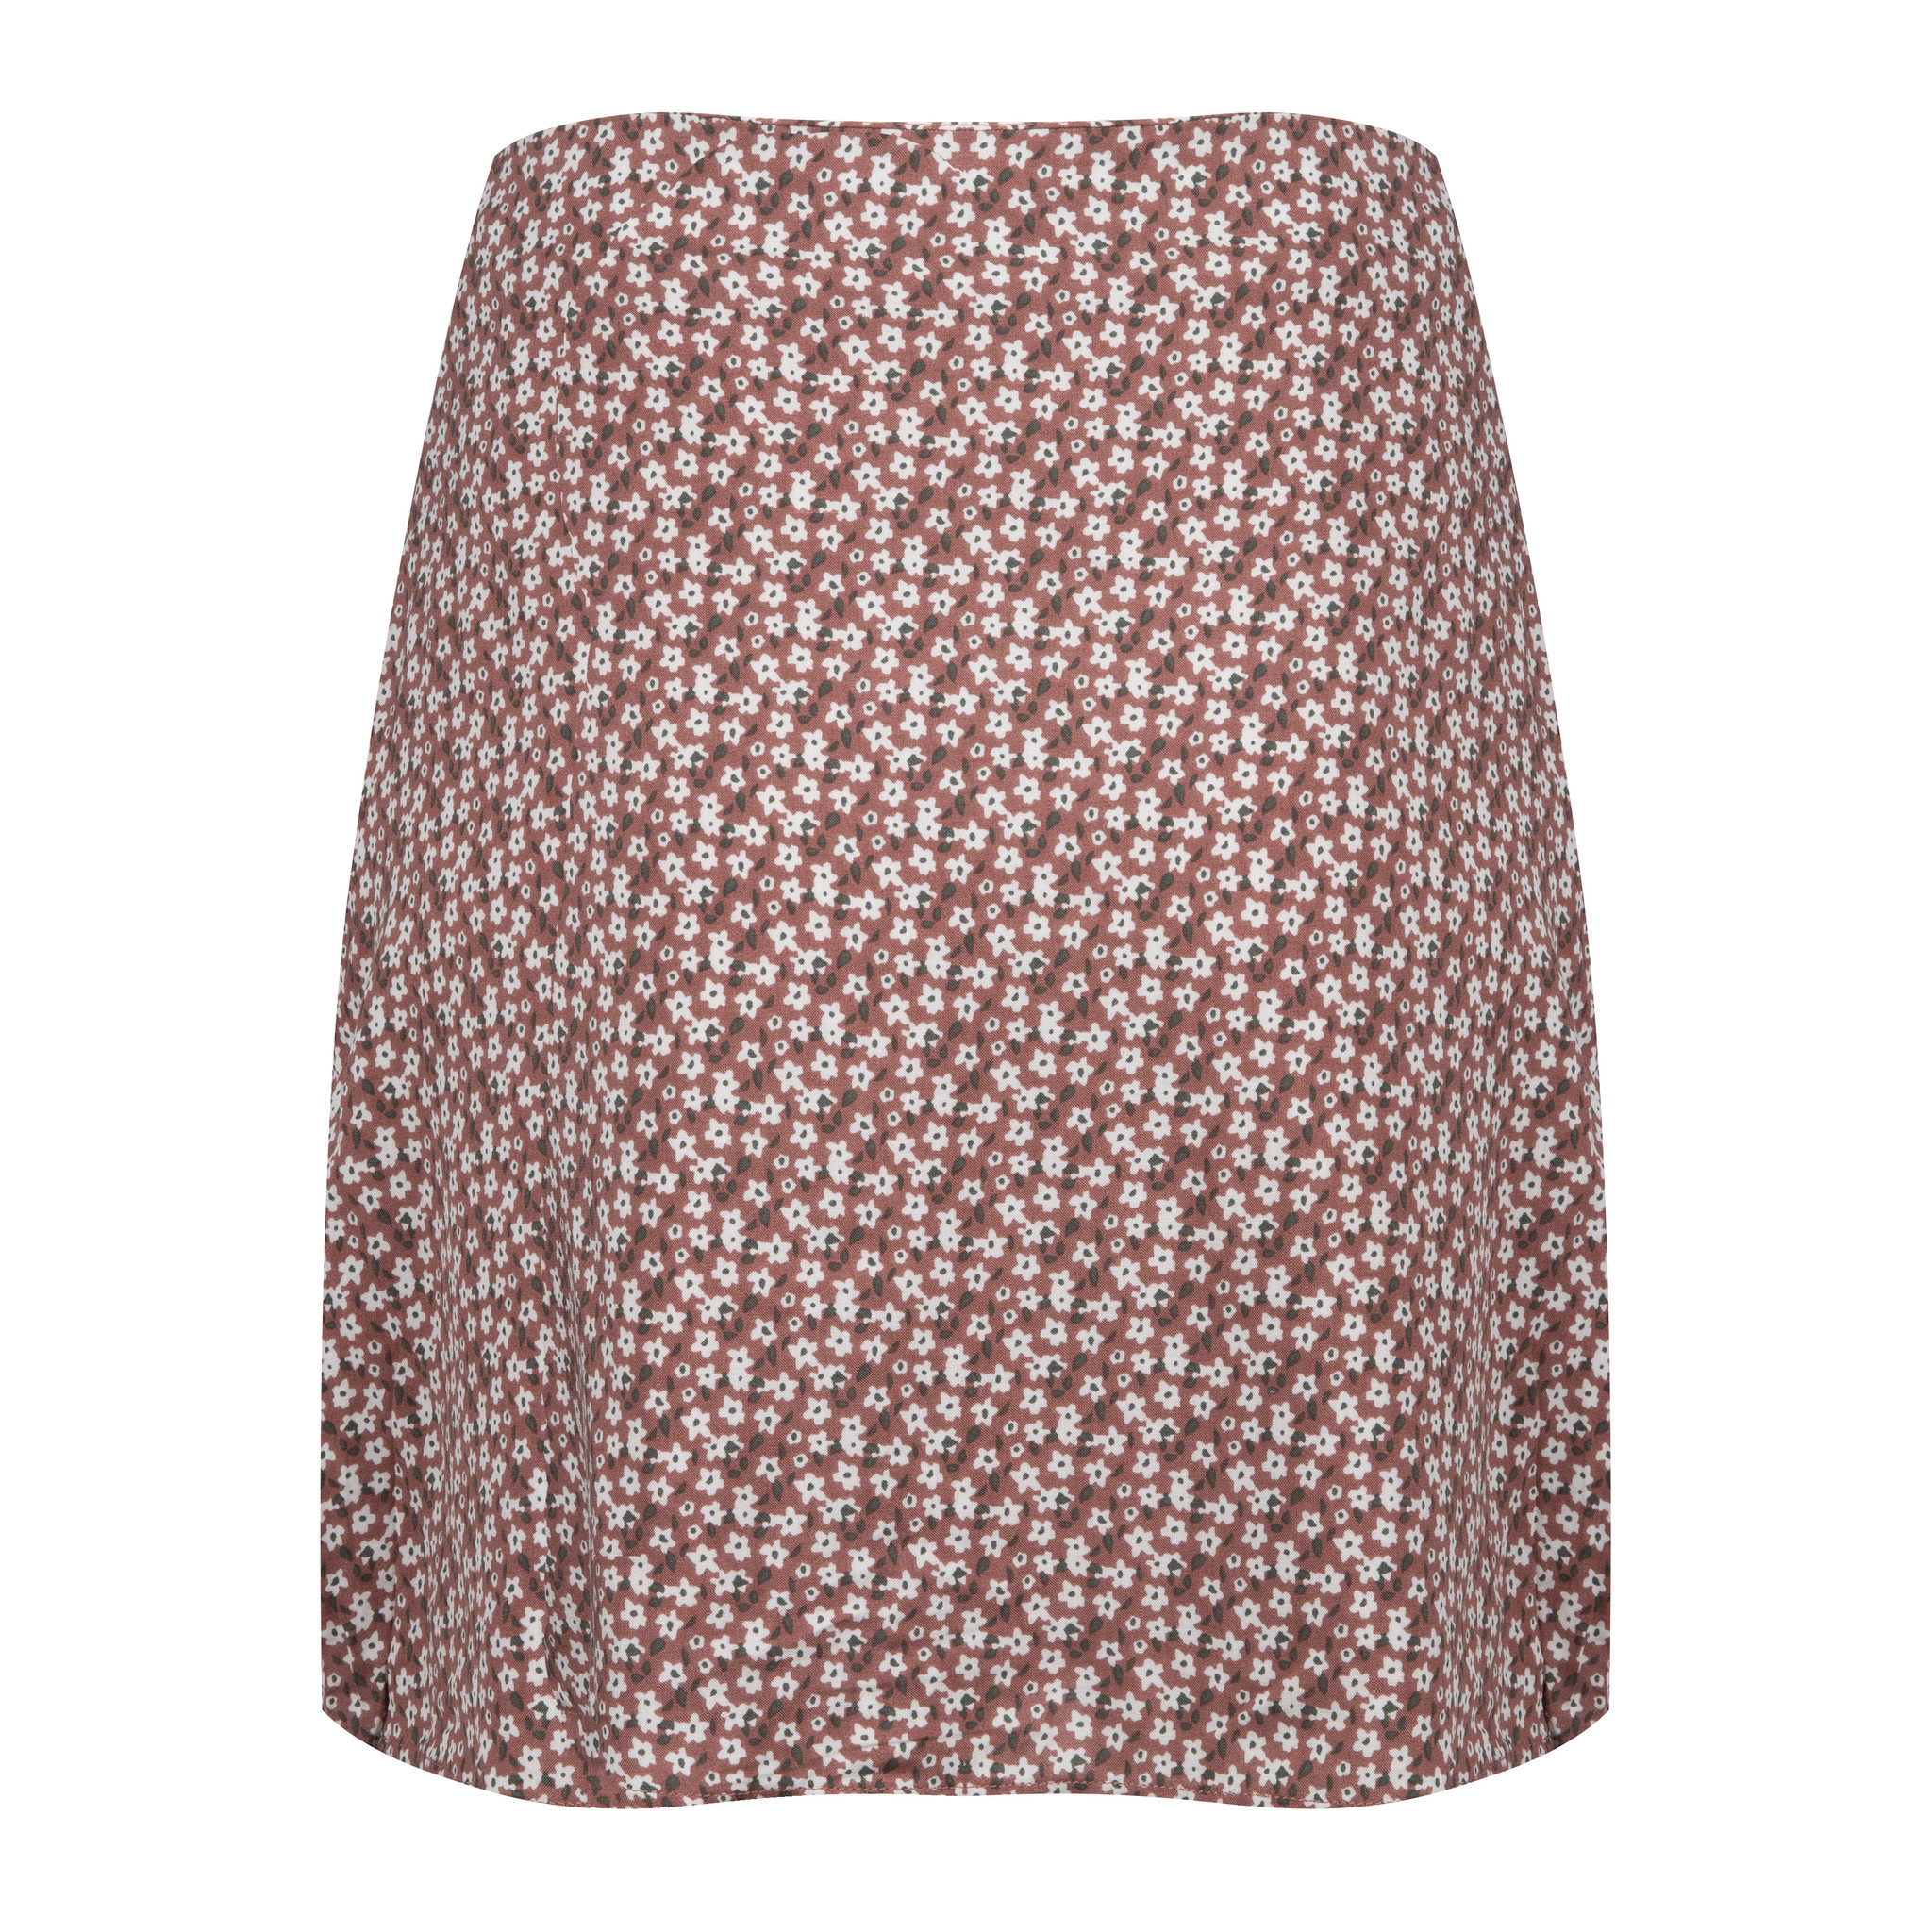 Lofty Manner Pink Flower Print Skirt Marly